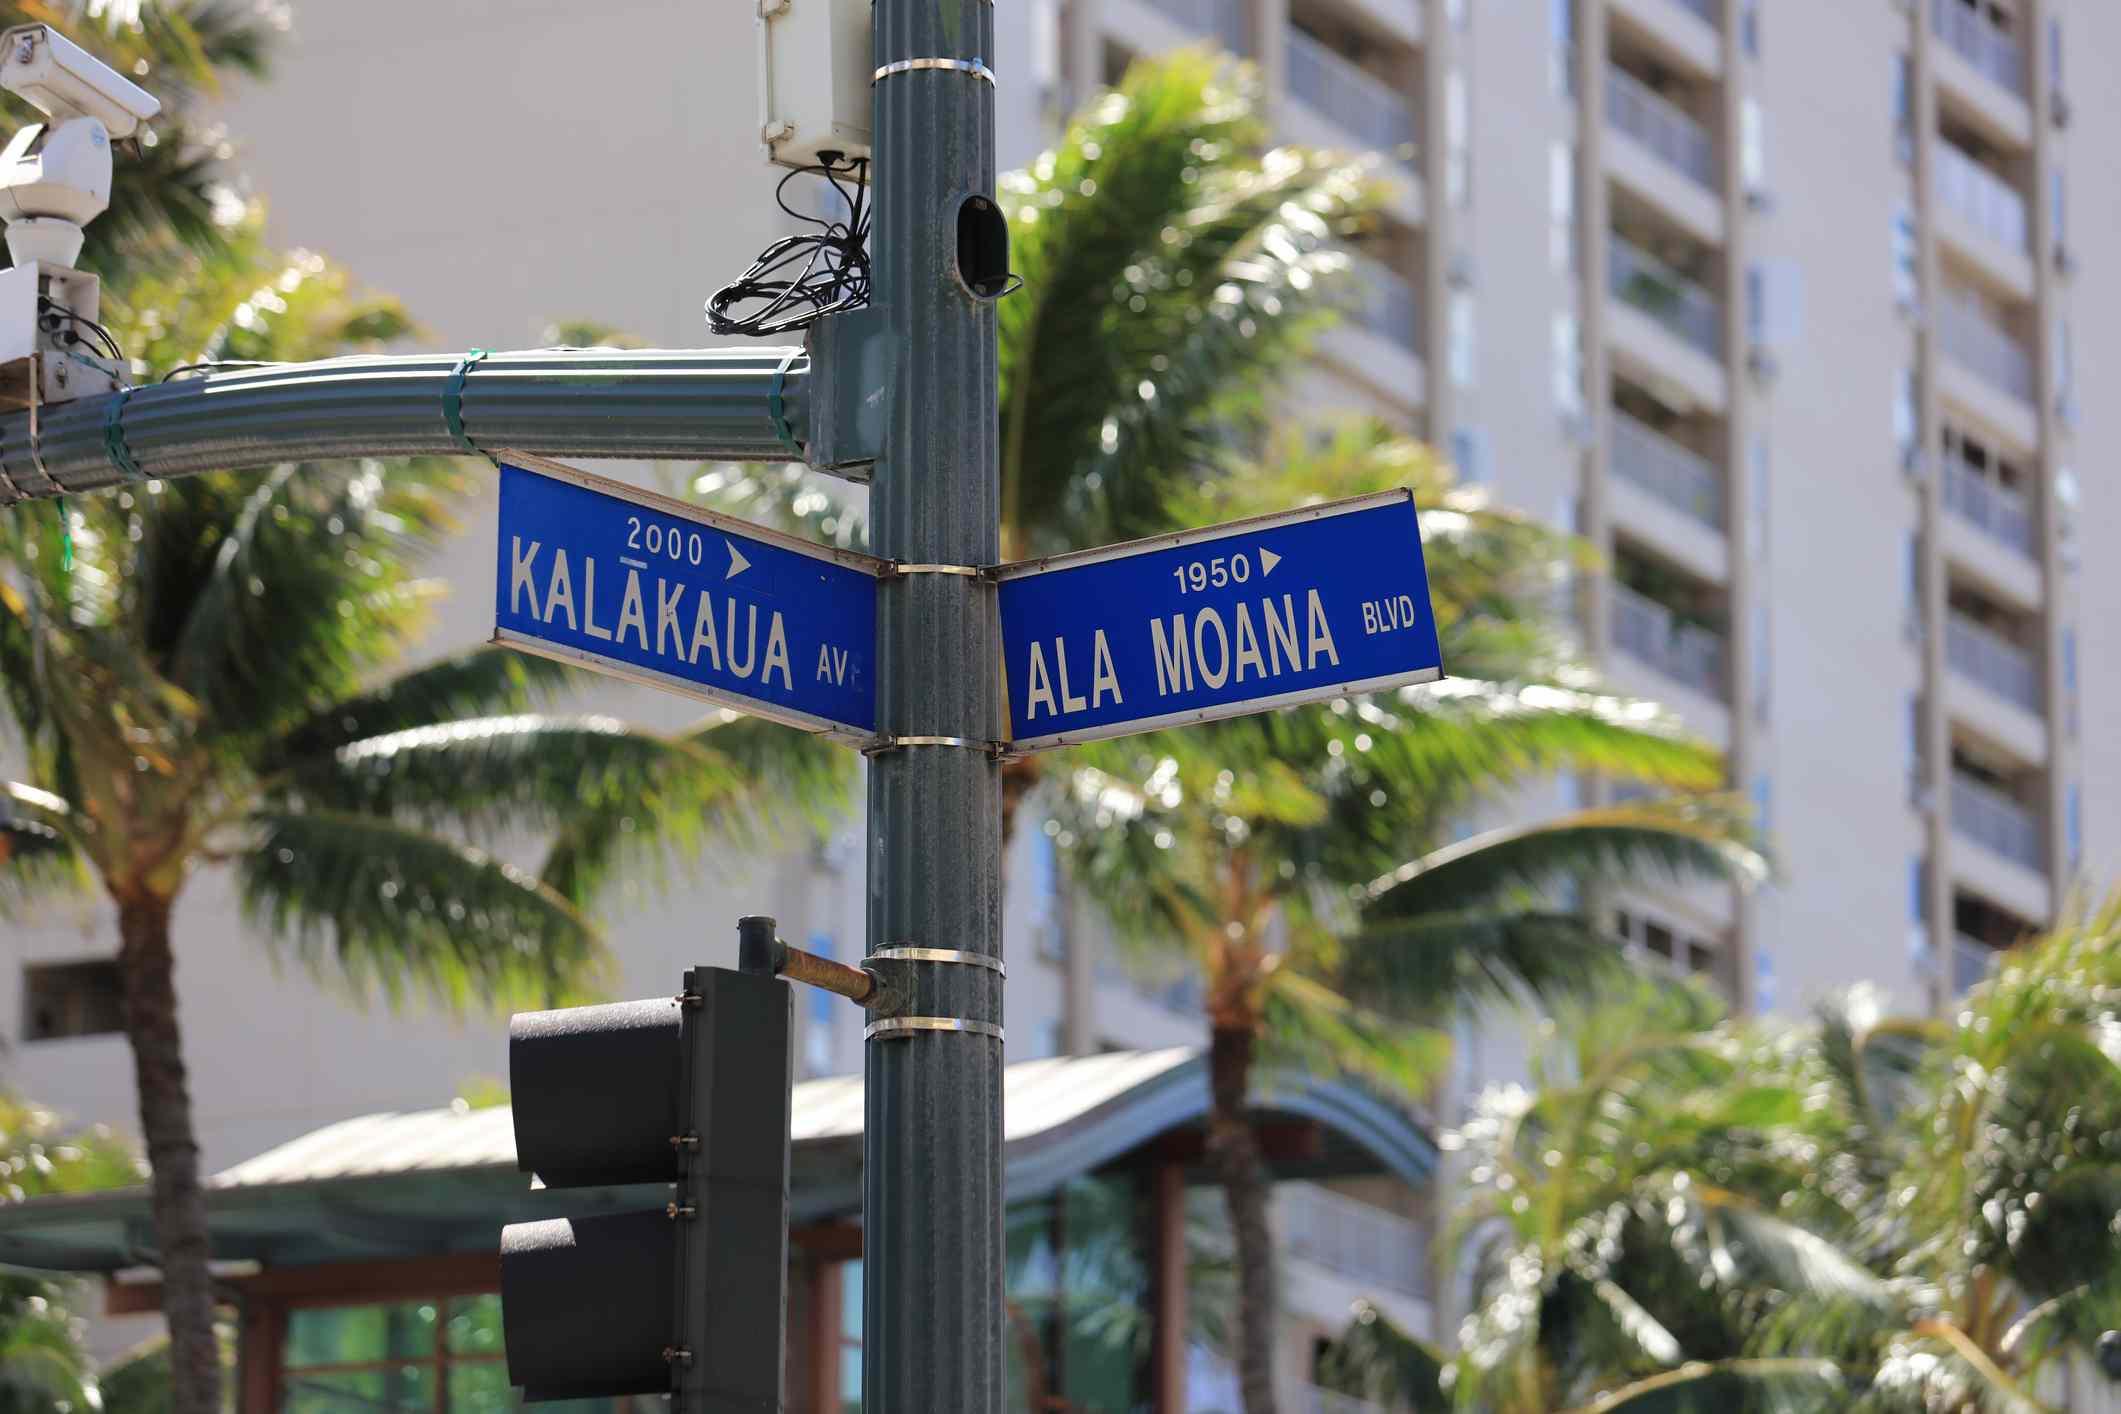 Crosswalk and street signs in Hawaii.